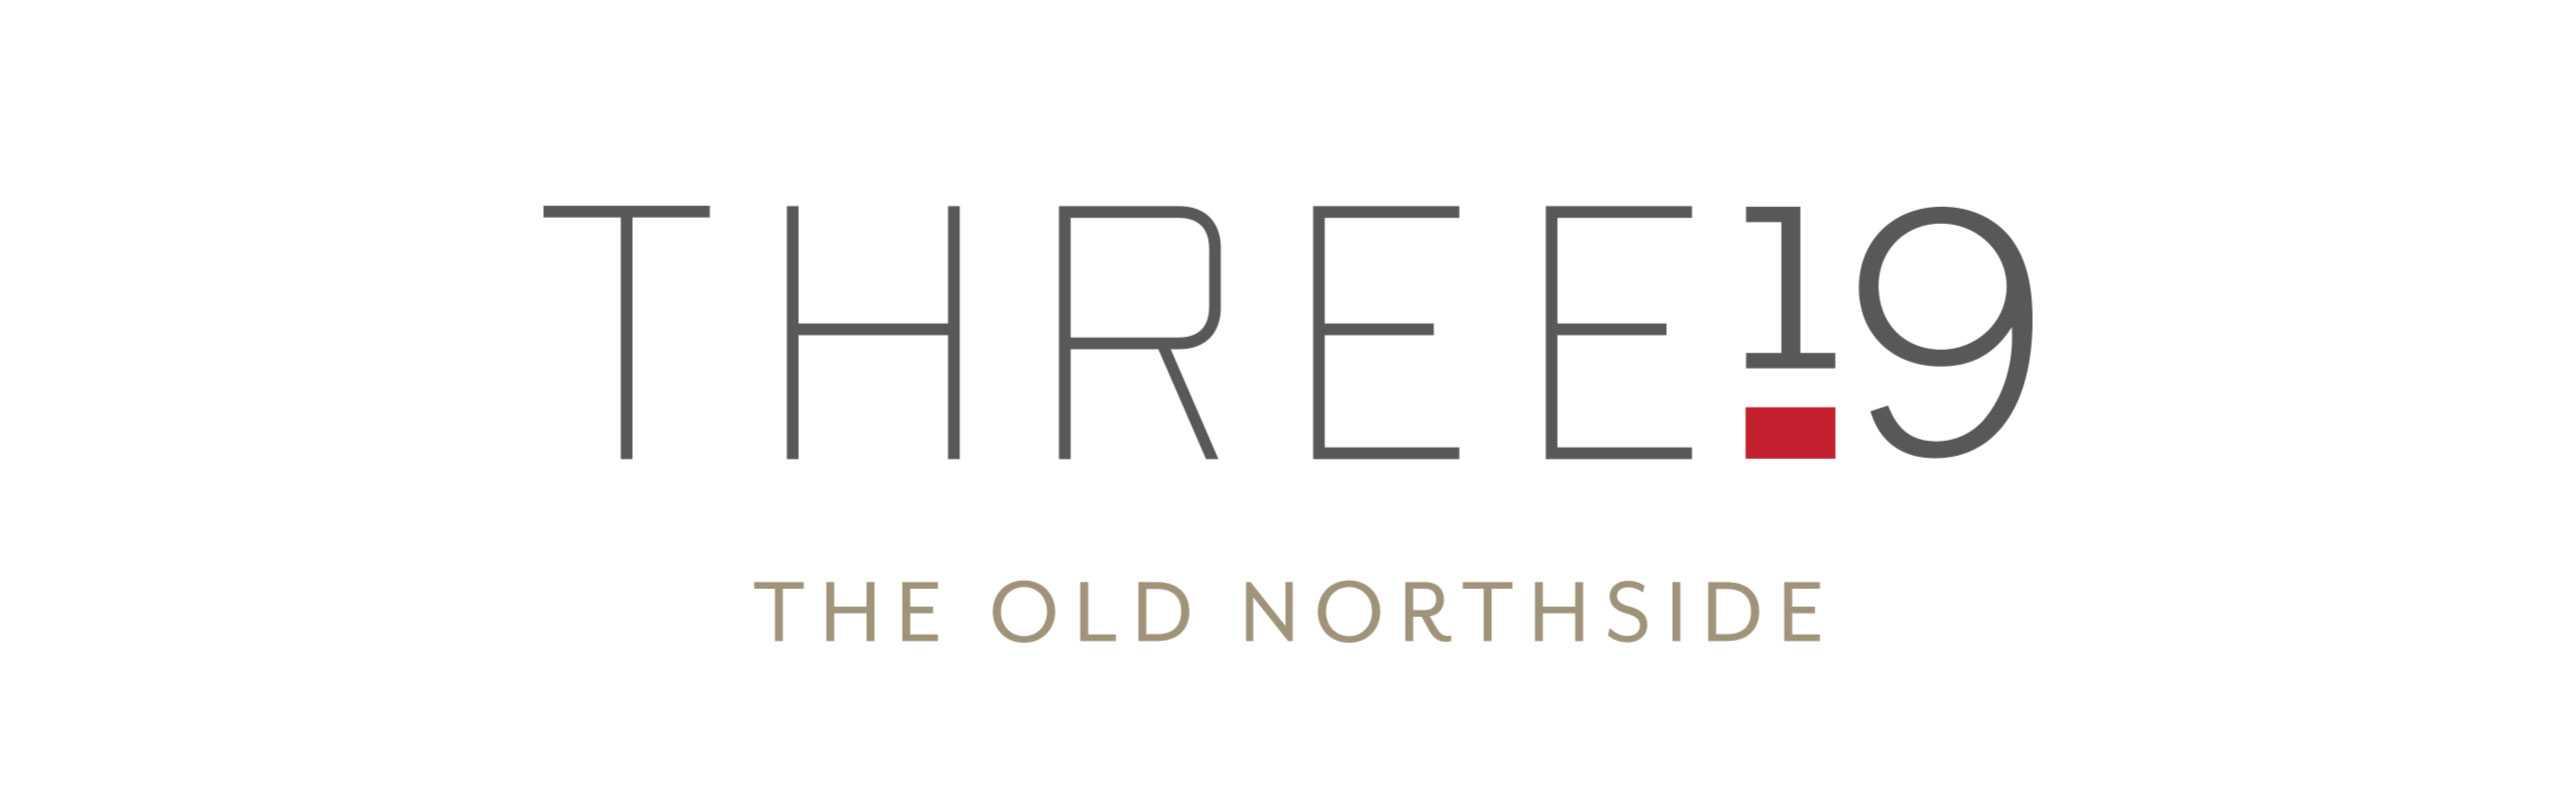 The final Three 19 logo